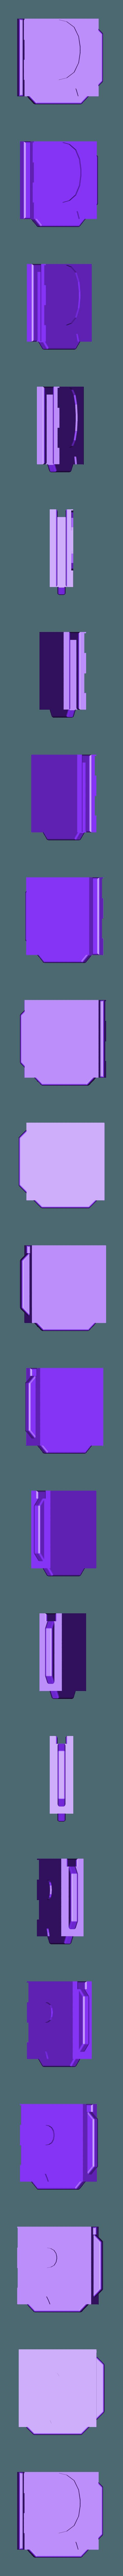 Piece - Part 20.stl Download free STL file Taquin CULTS / Sliding Puzzle • 3D print model, Valelab3D